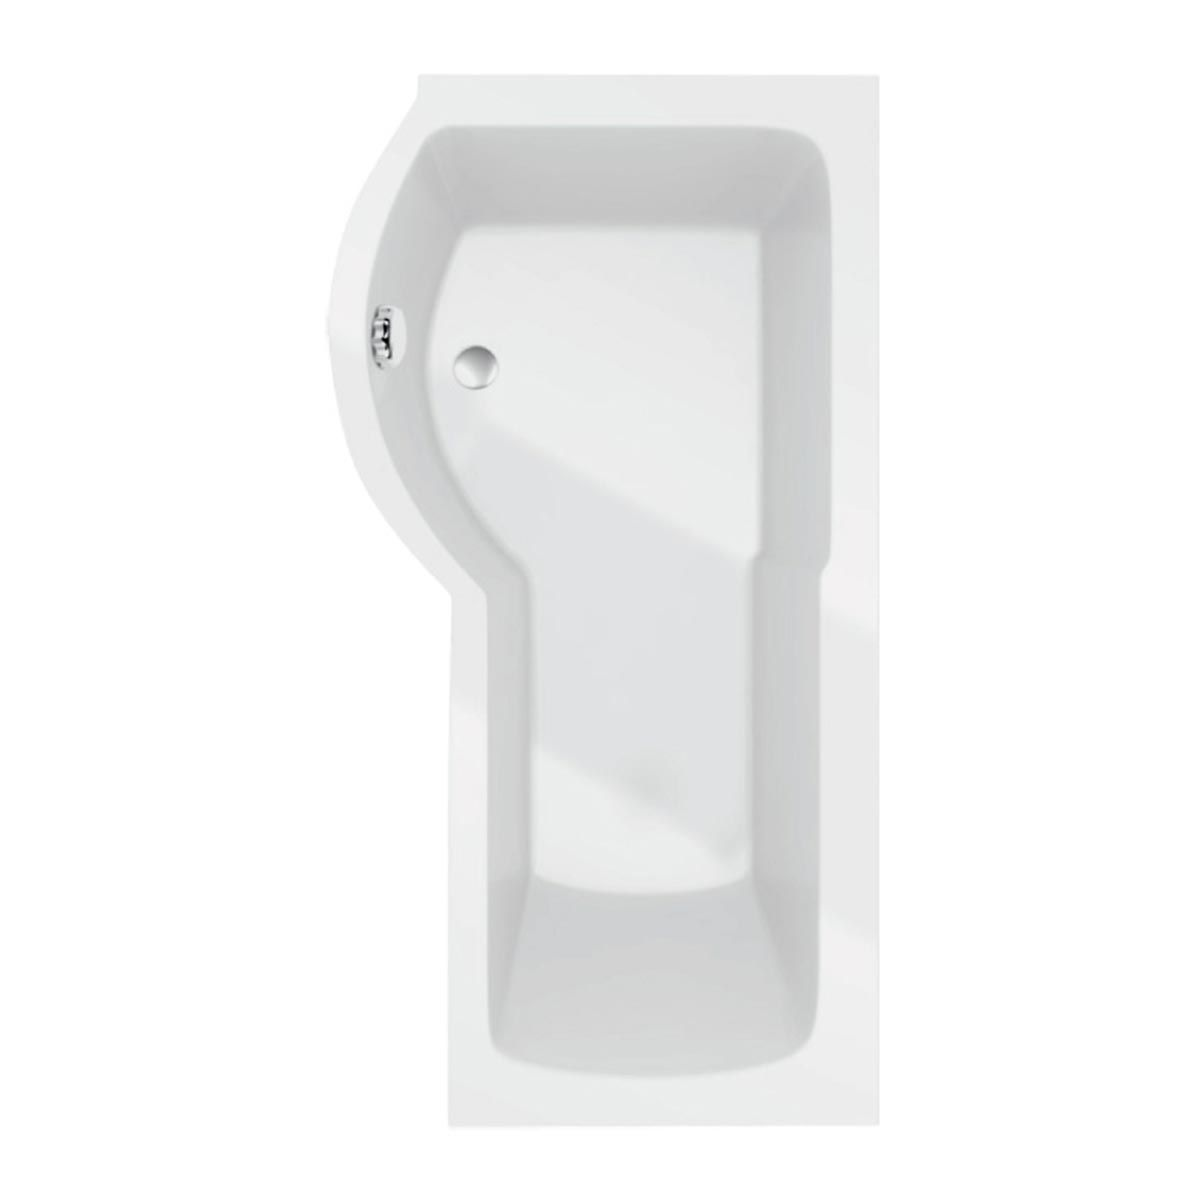 Kartell K-vit White Adapt P Shaped Left Hand Bath Only with Leg Sets 1500mm